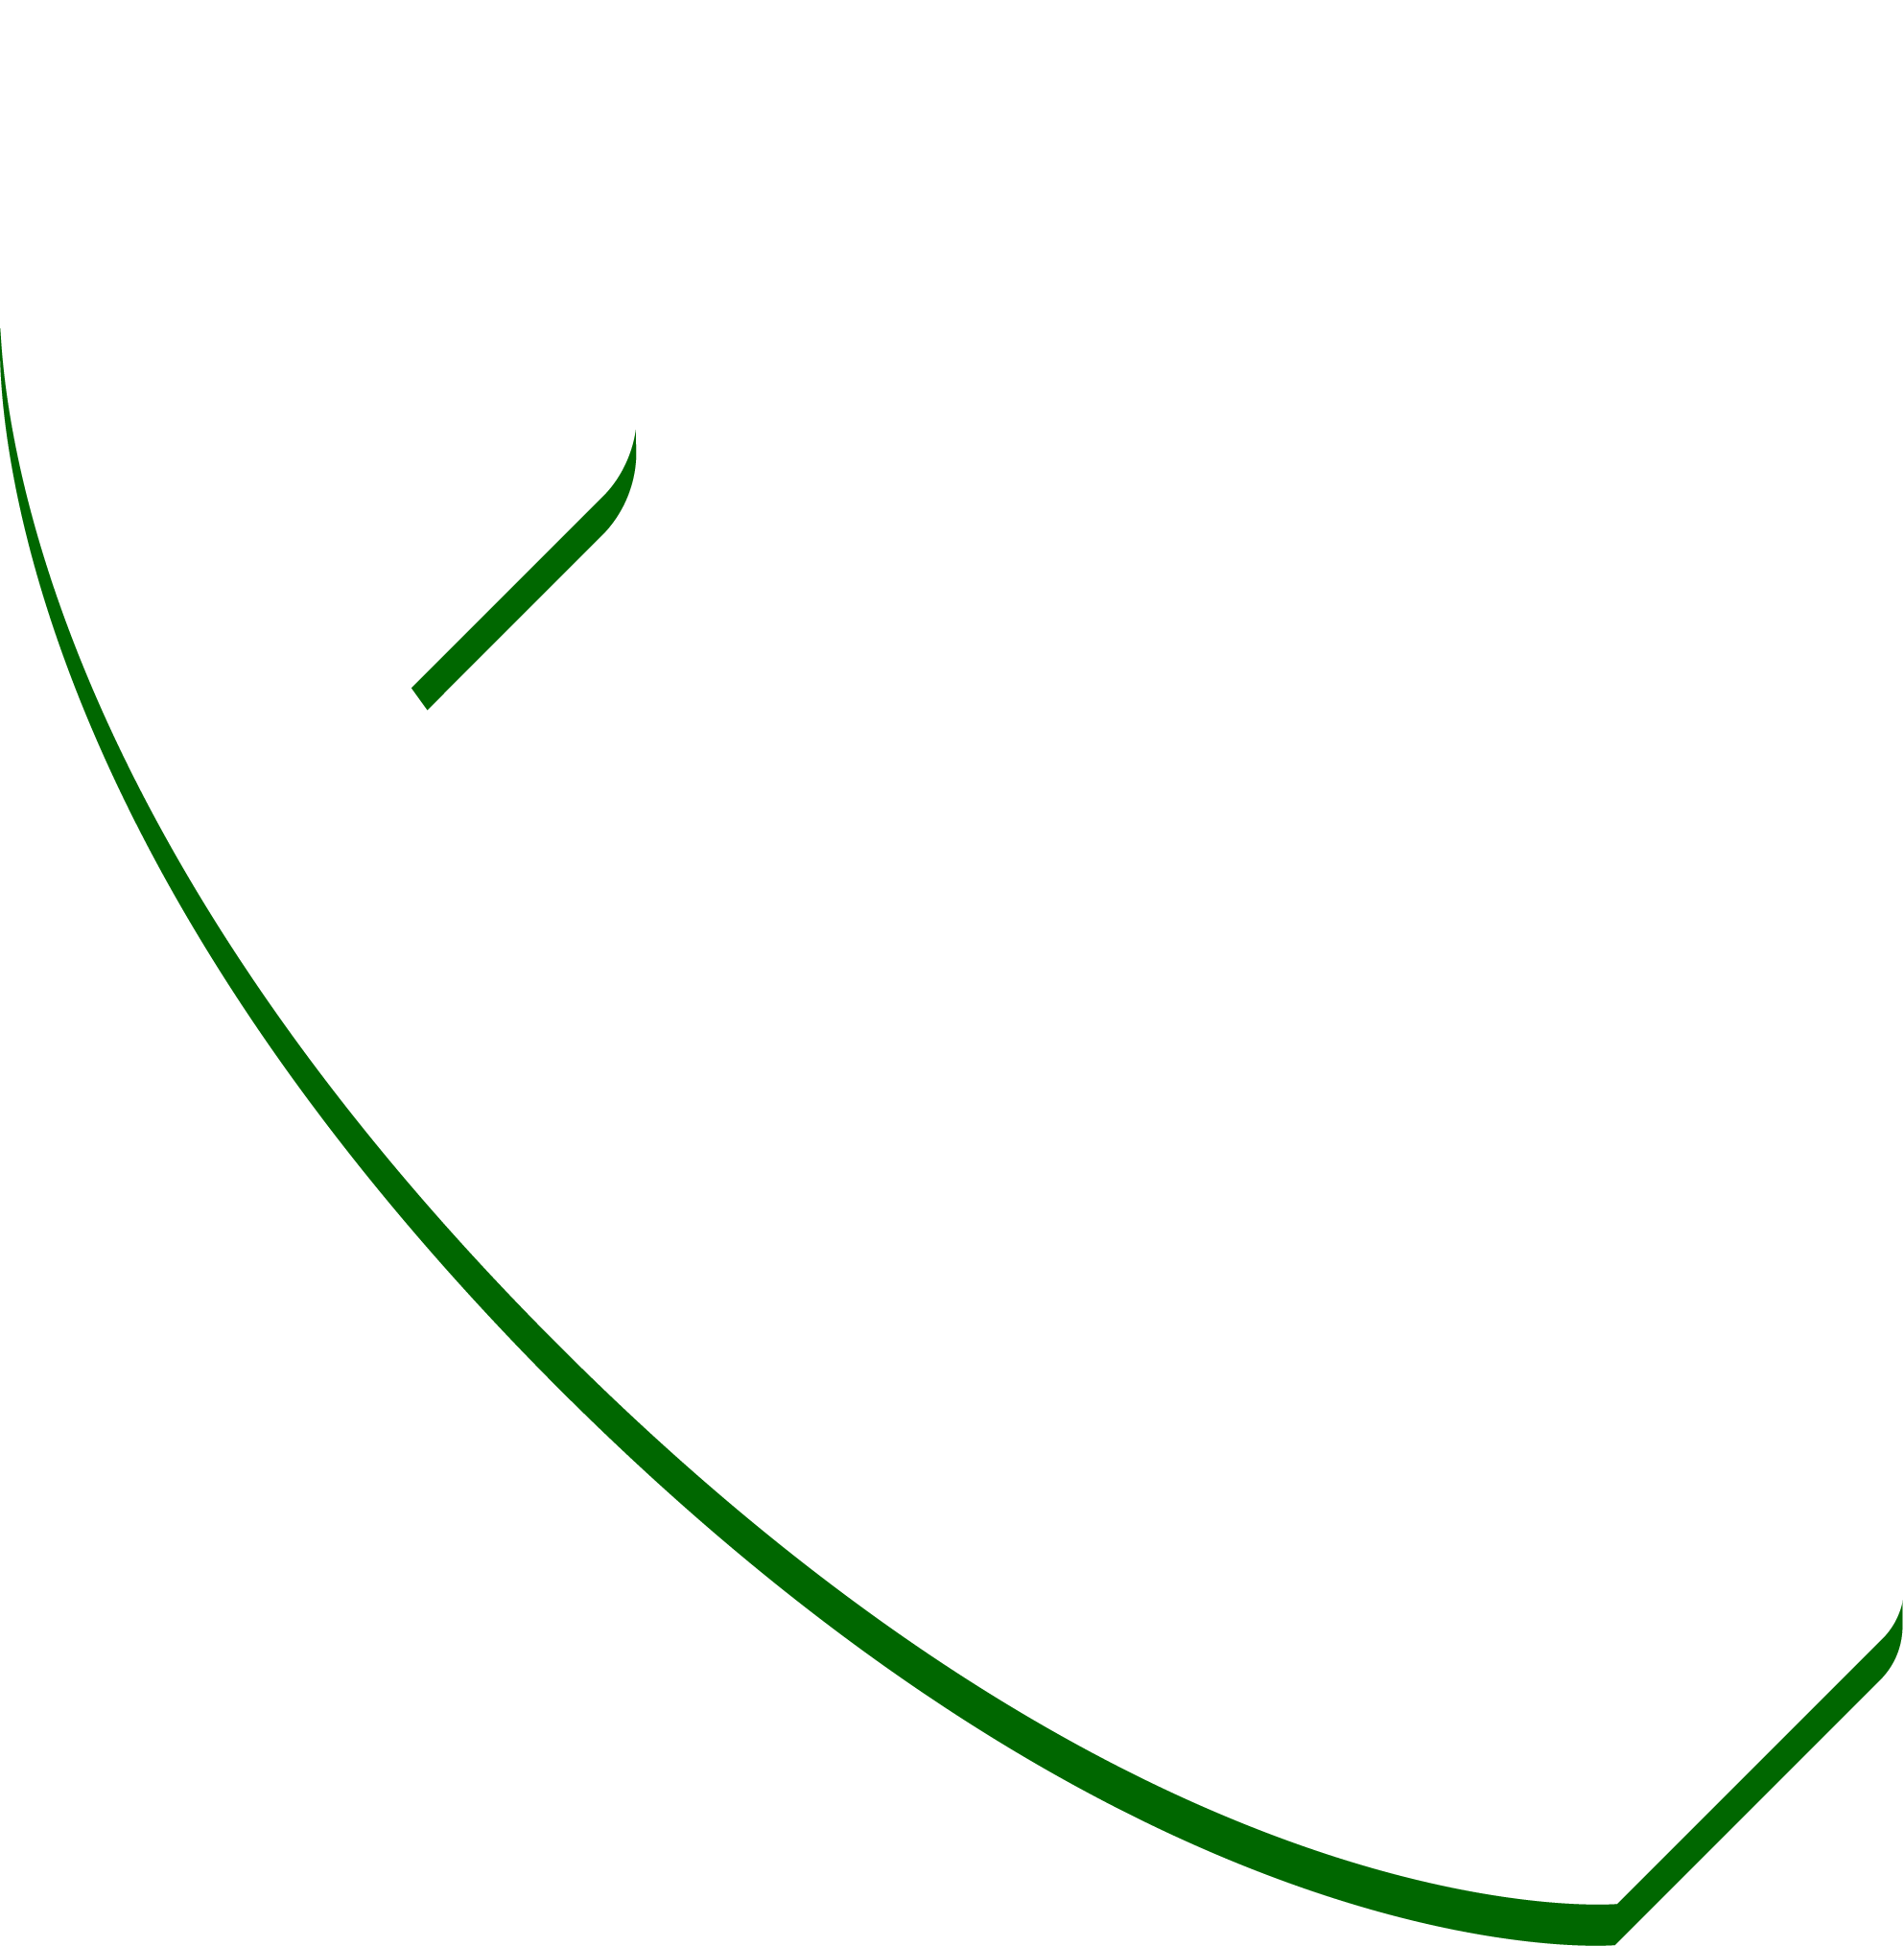 Hotline 02473097995